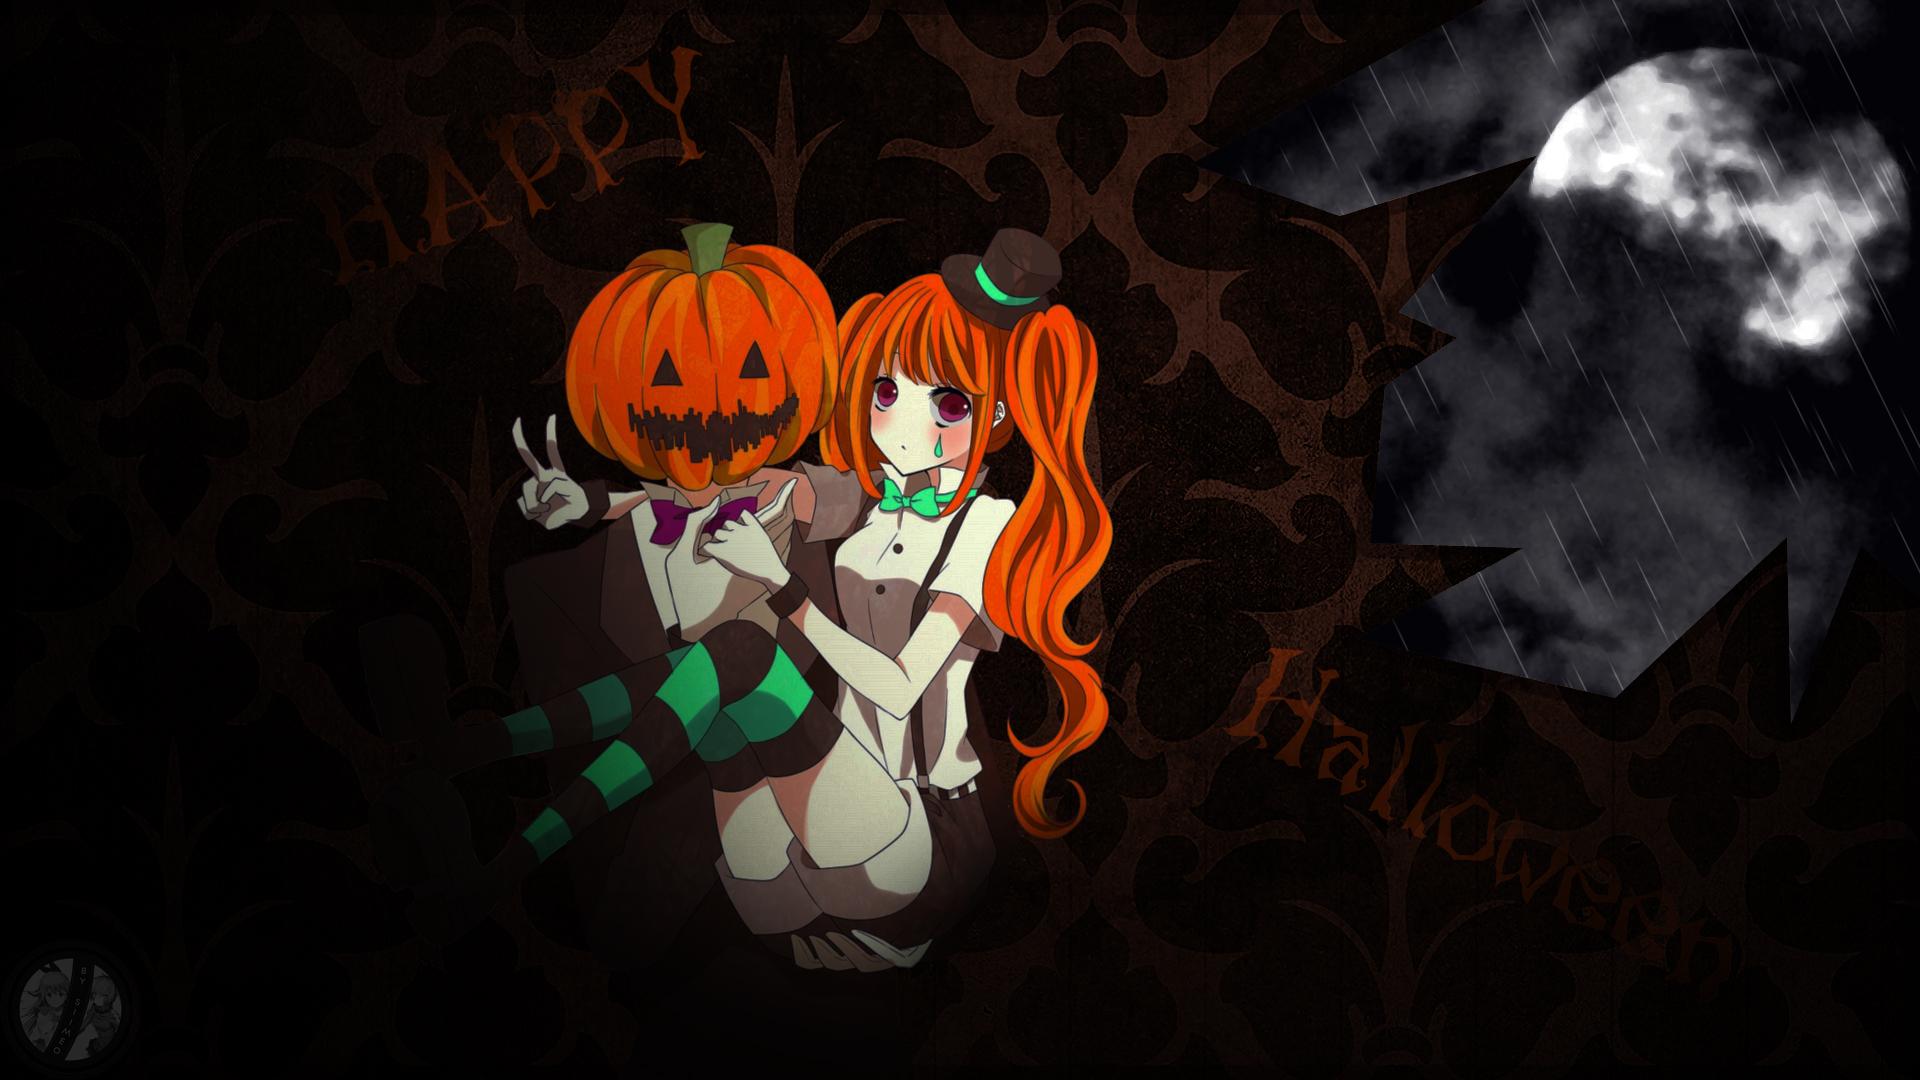 Happy Halloween - Anime Wallpaper by Siimeo on DeviantArt